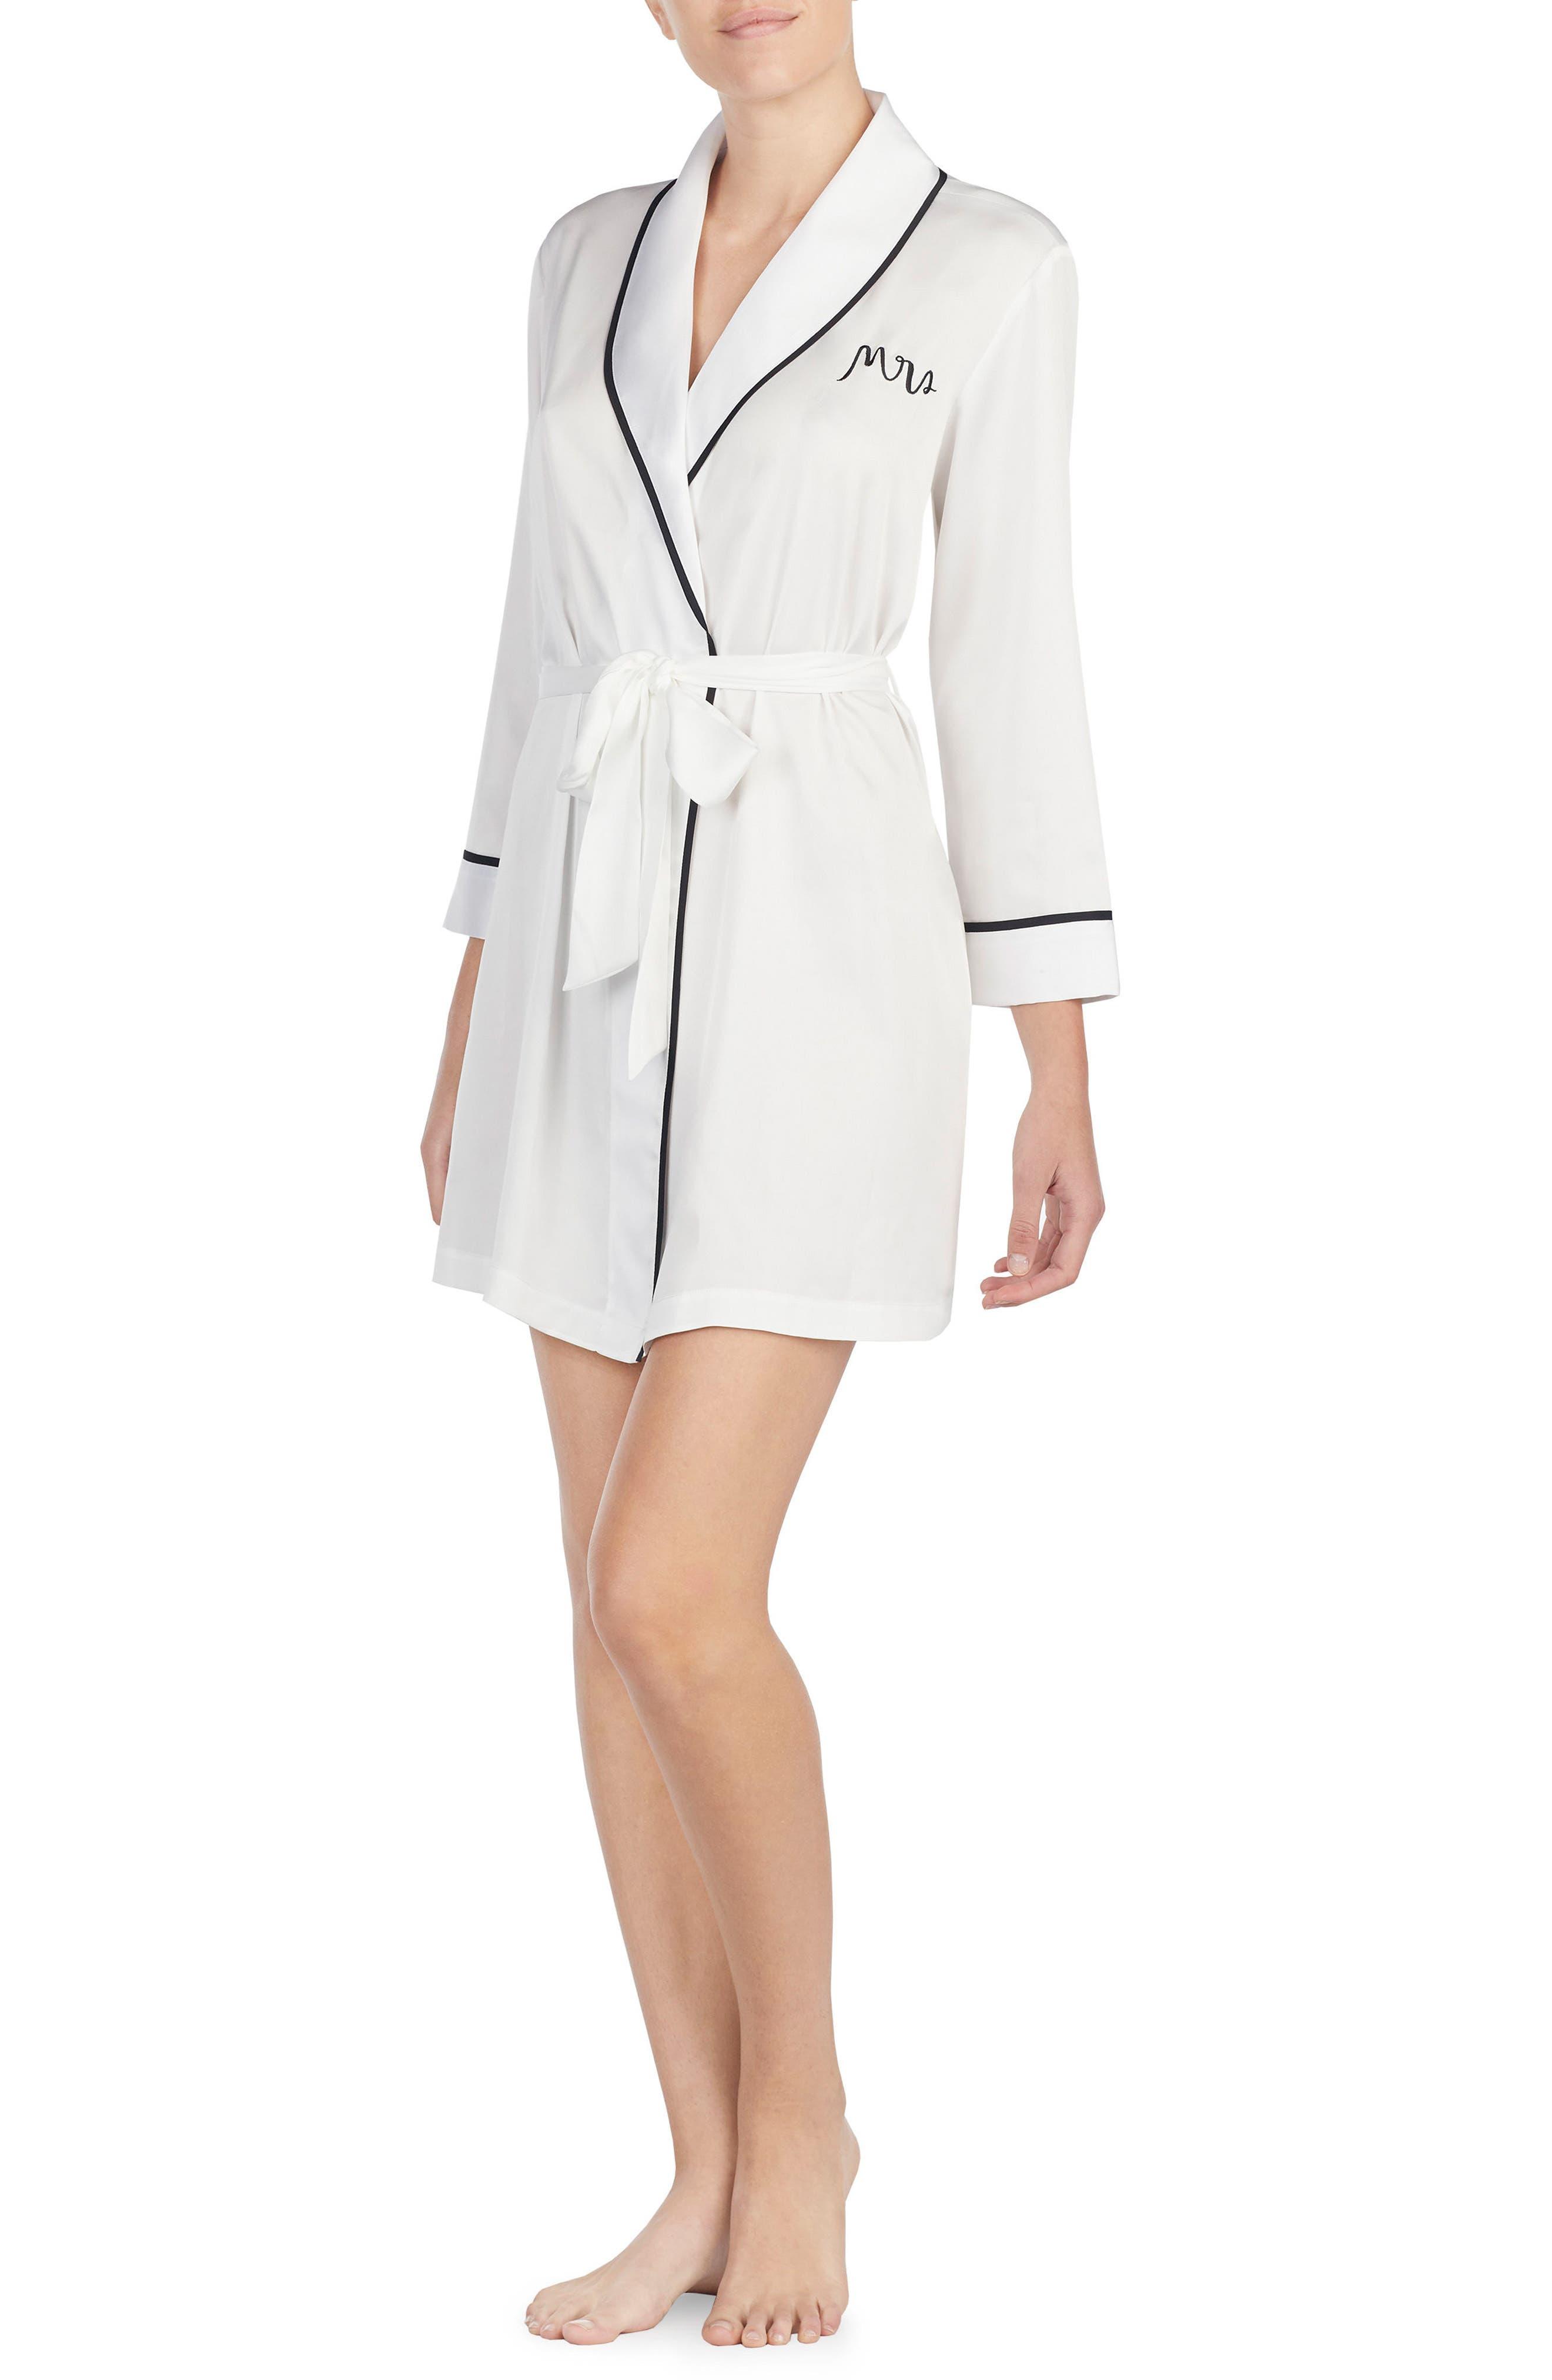 KATE SPADE NEW YORK, mrs charmeuse short robe, Main thumbnail 1, color, OFF WHITE